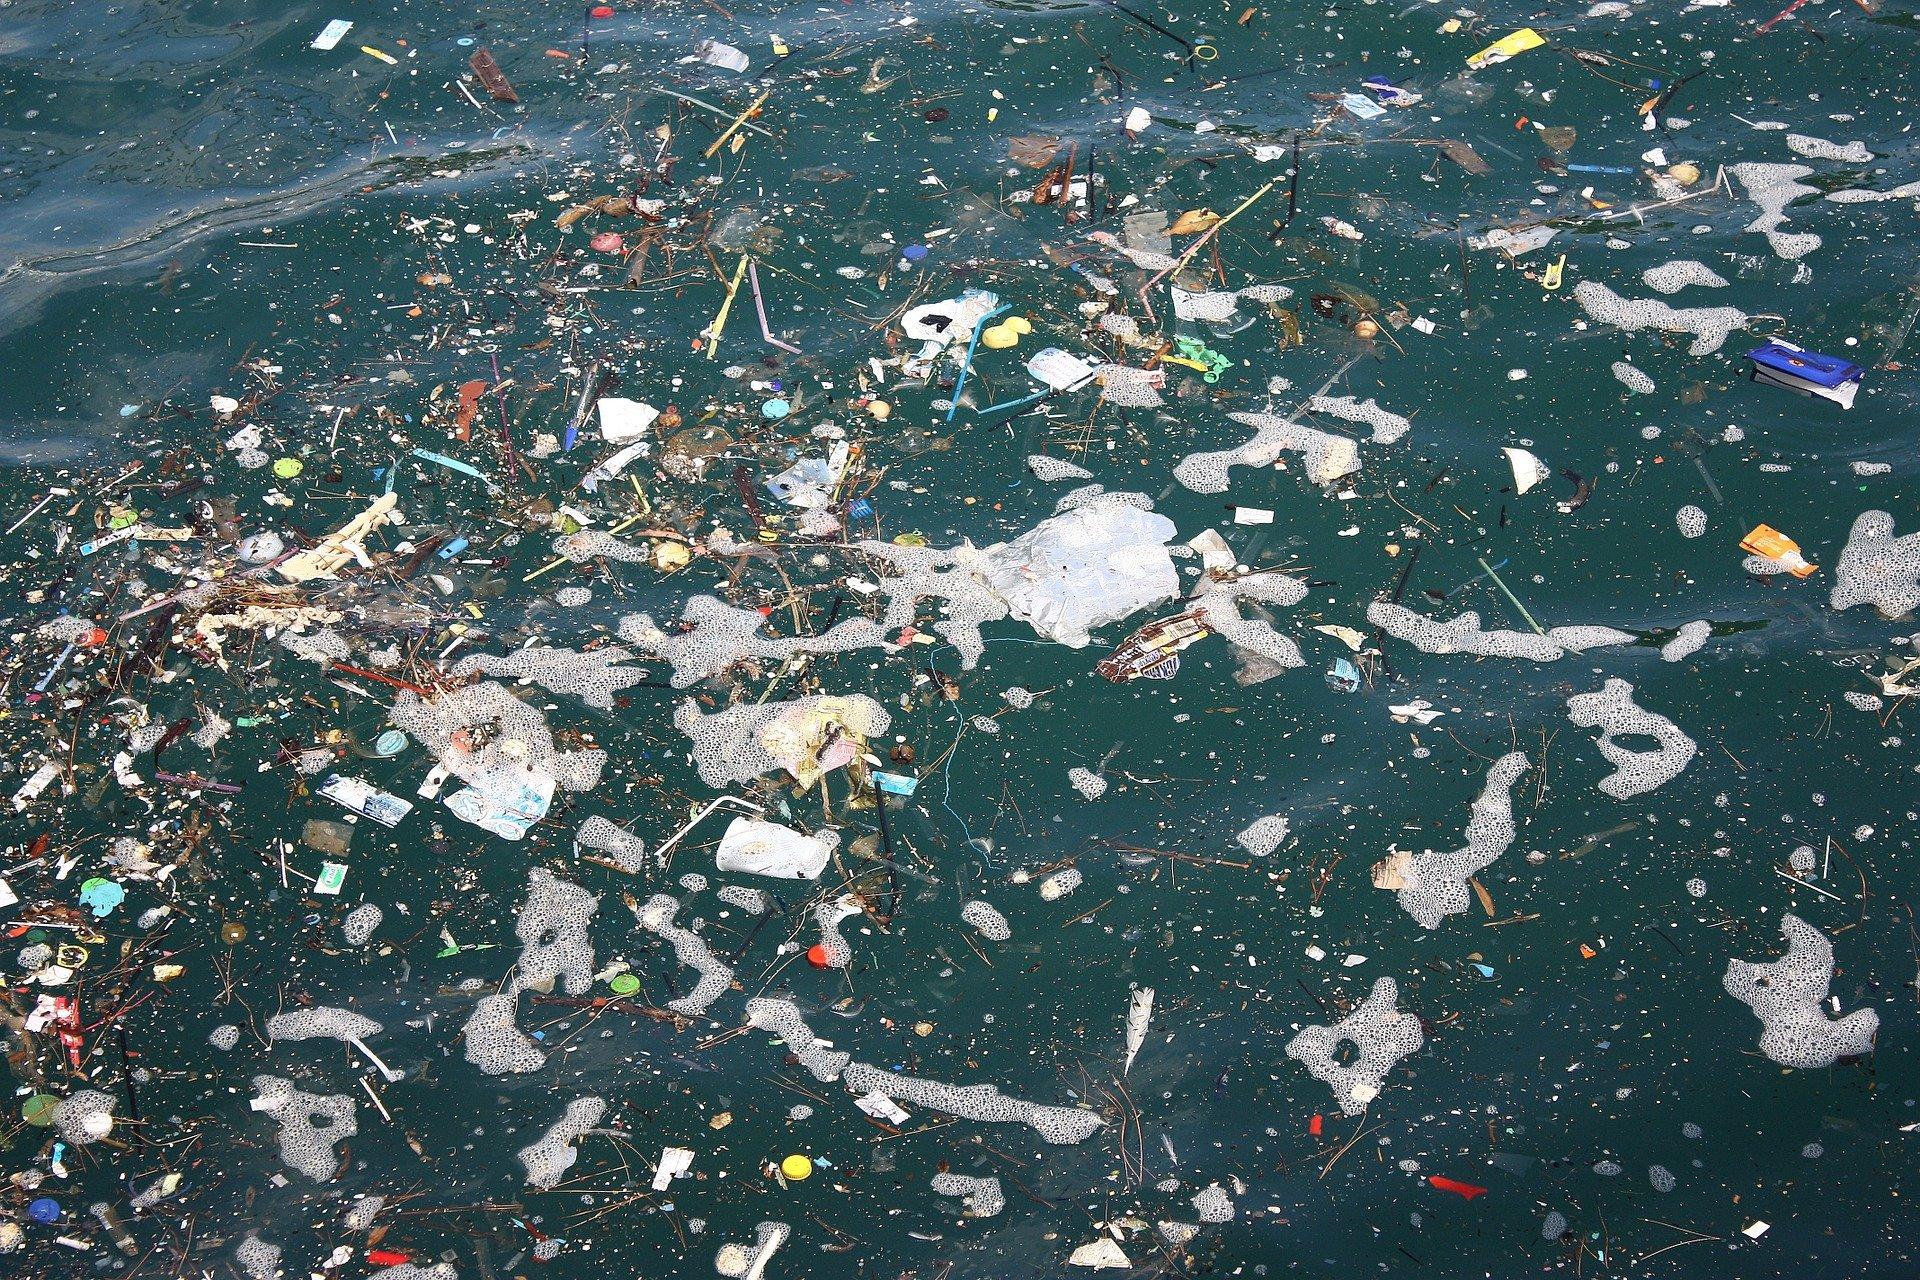 Müll im Meer